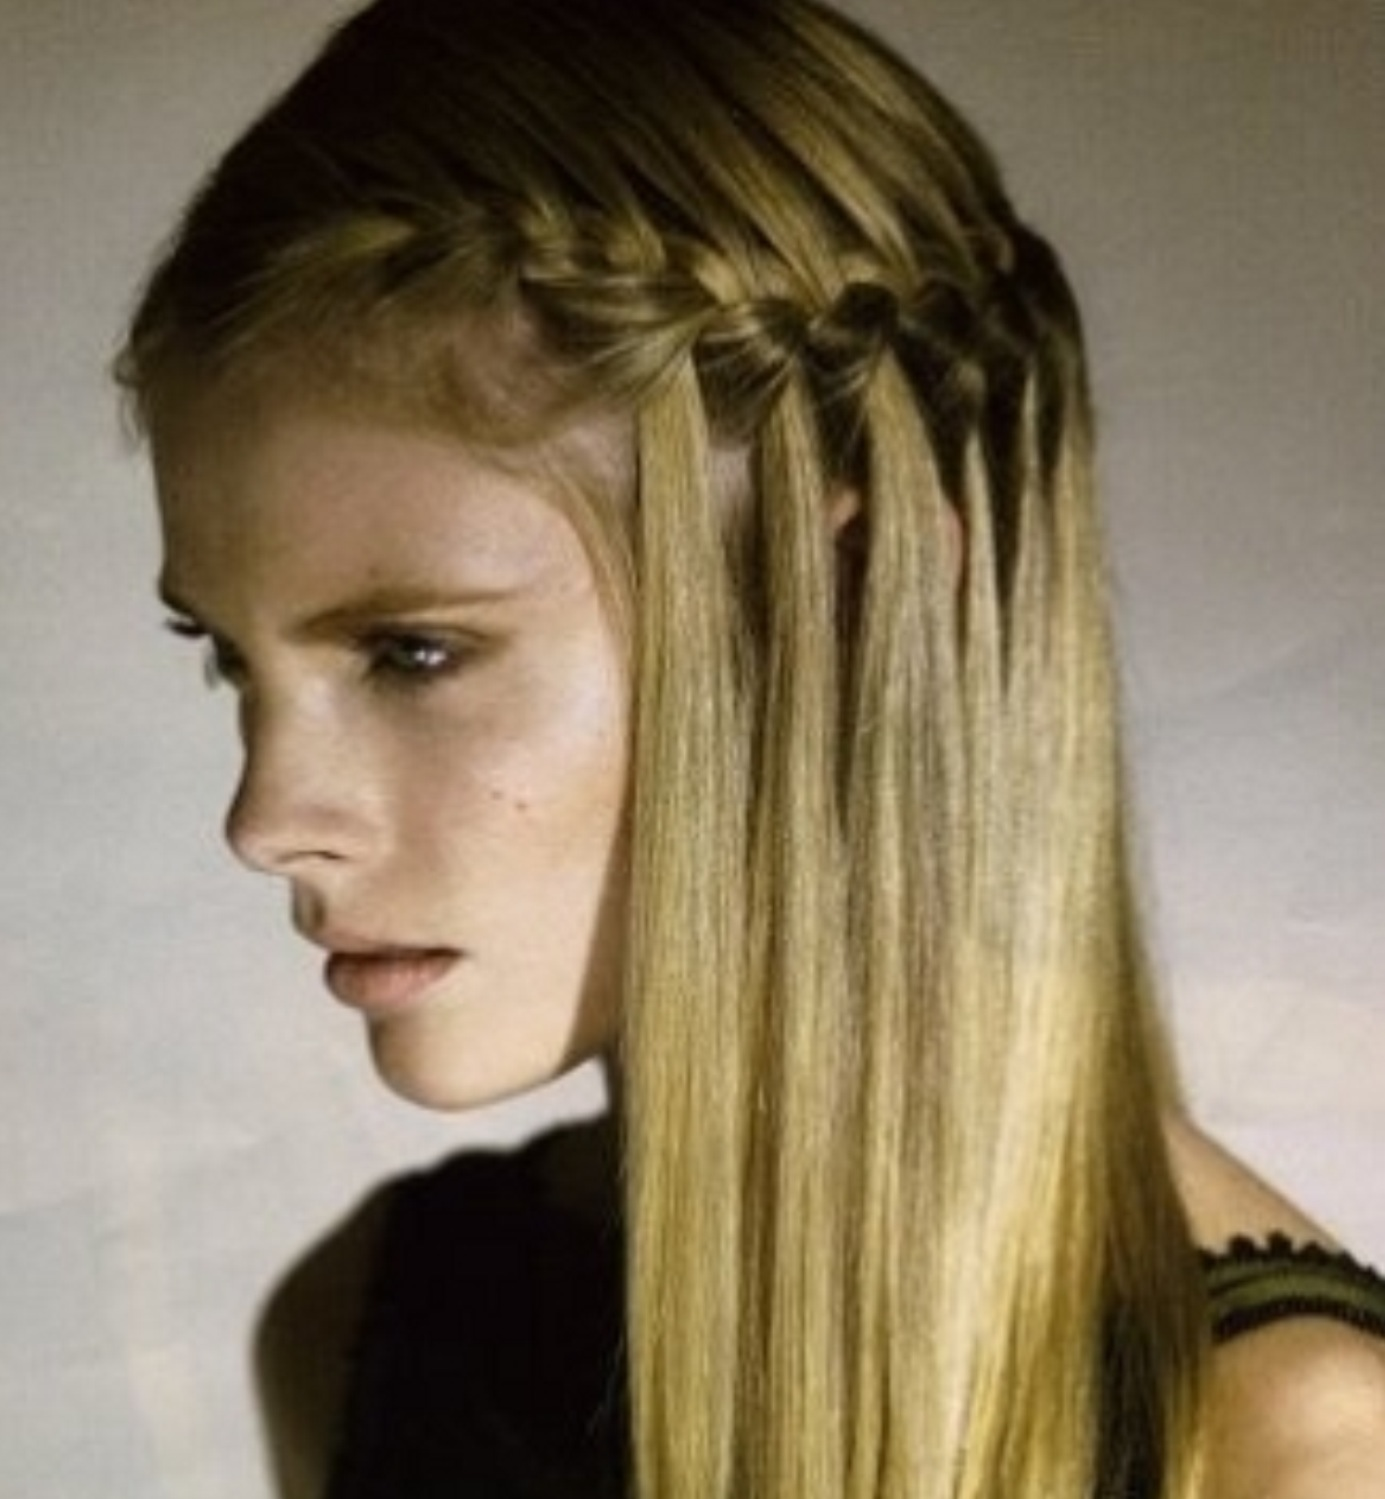 Причёски для коротких волос в школу фото